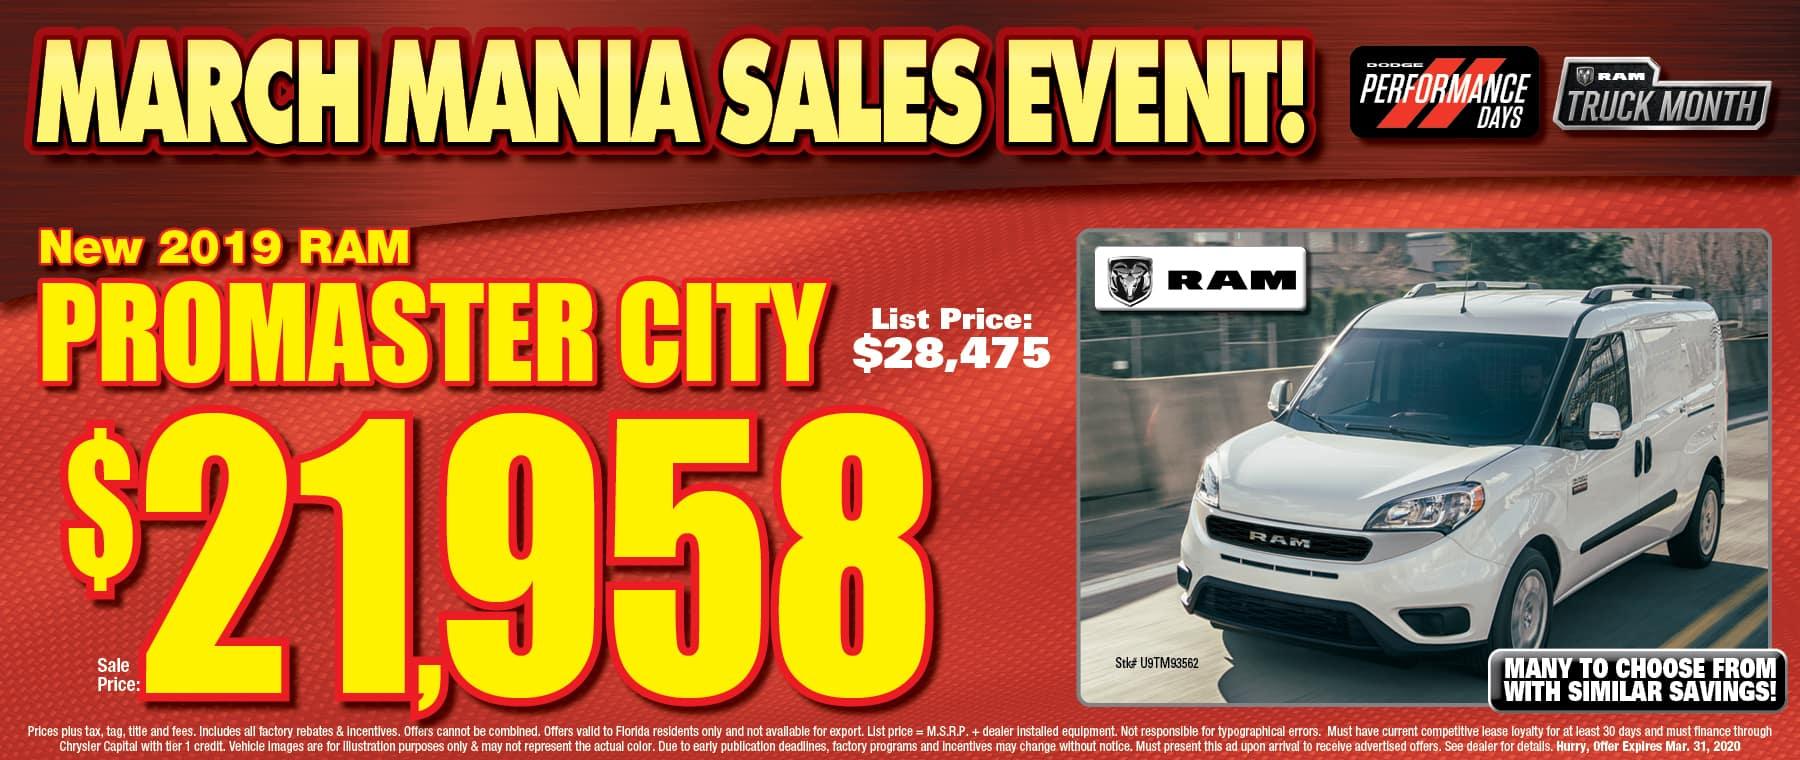 New Ram Promaster City! - At University Dodge RAM!